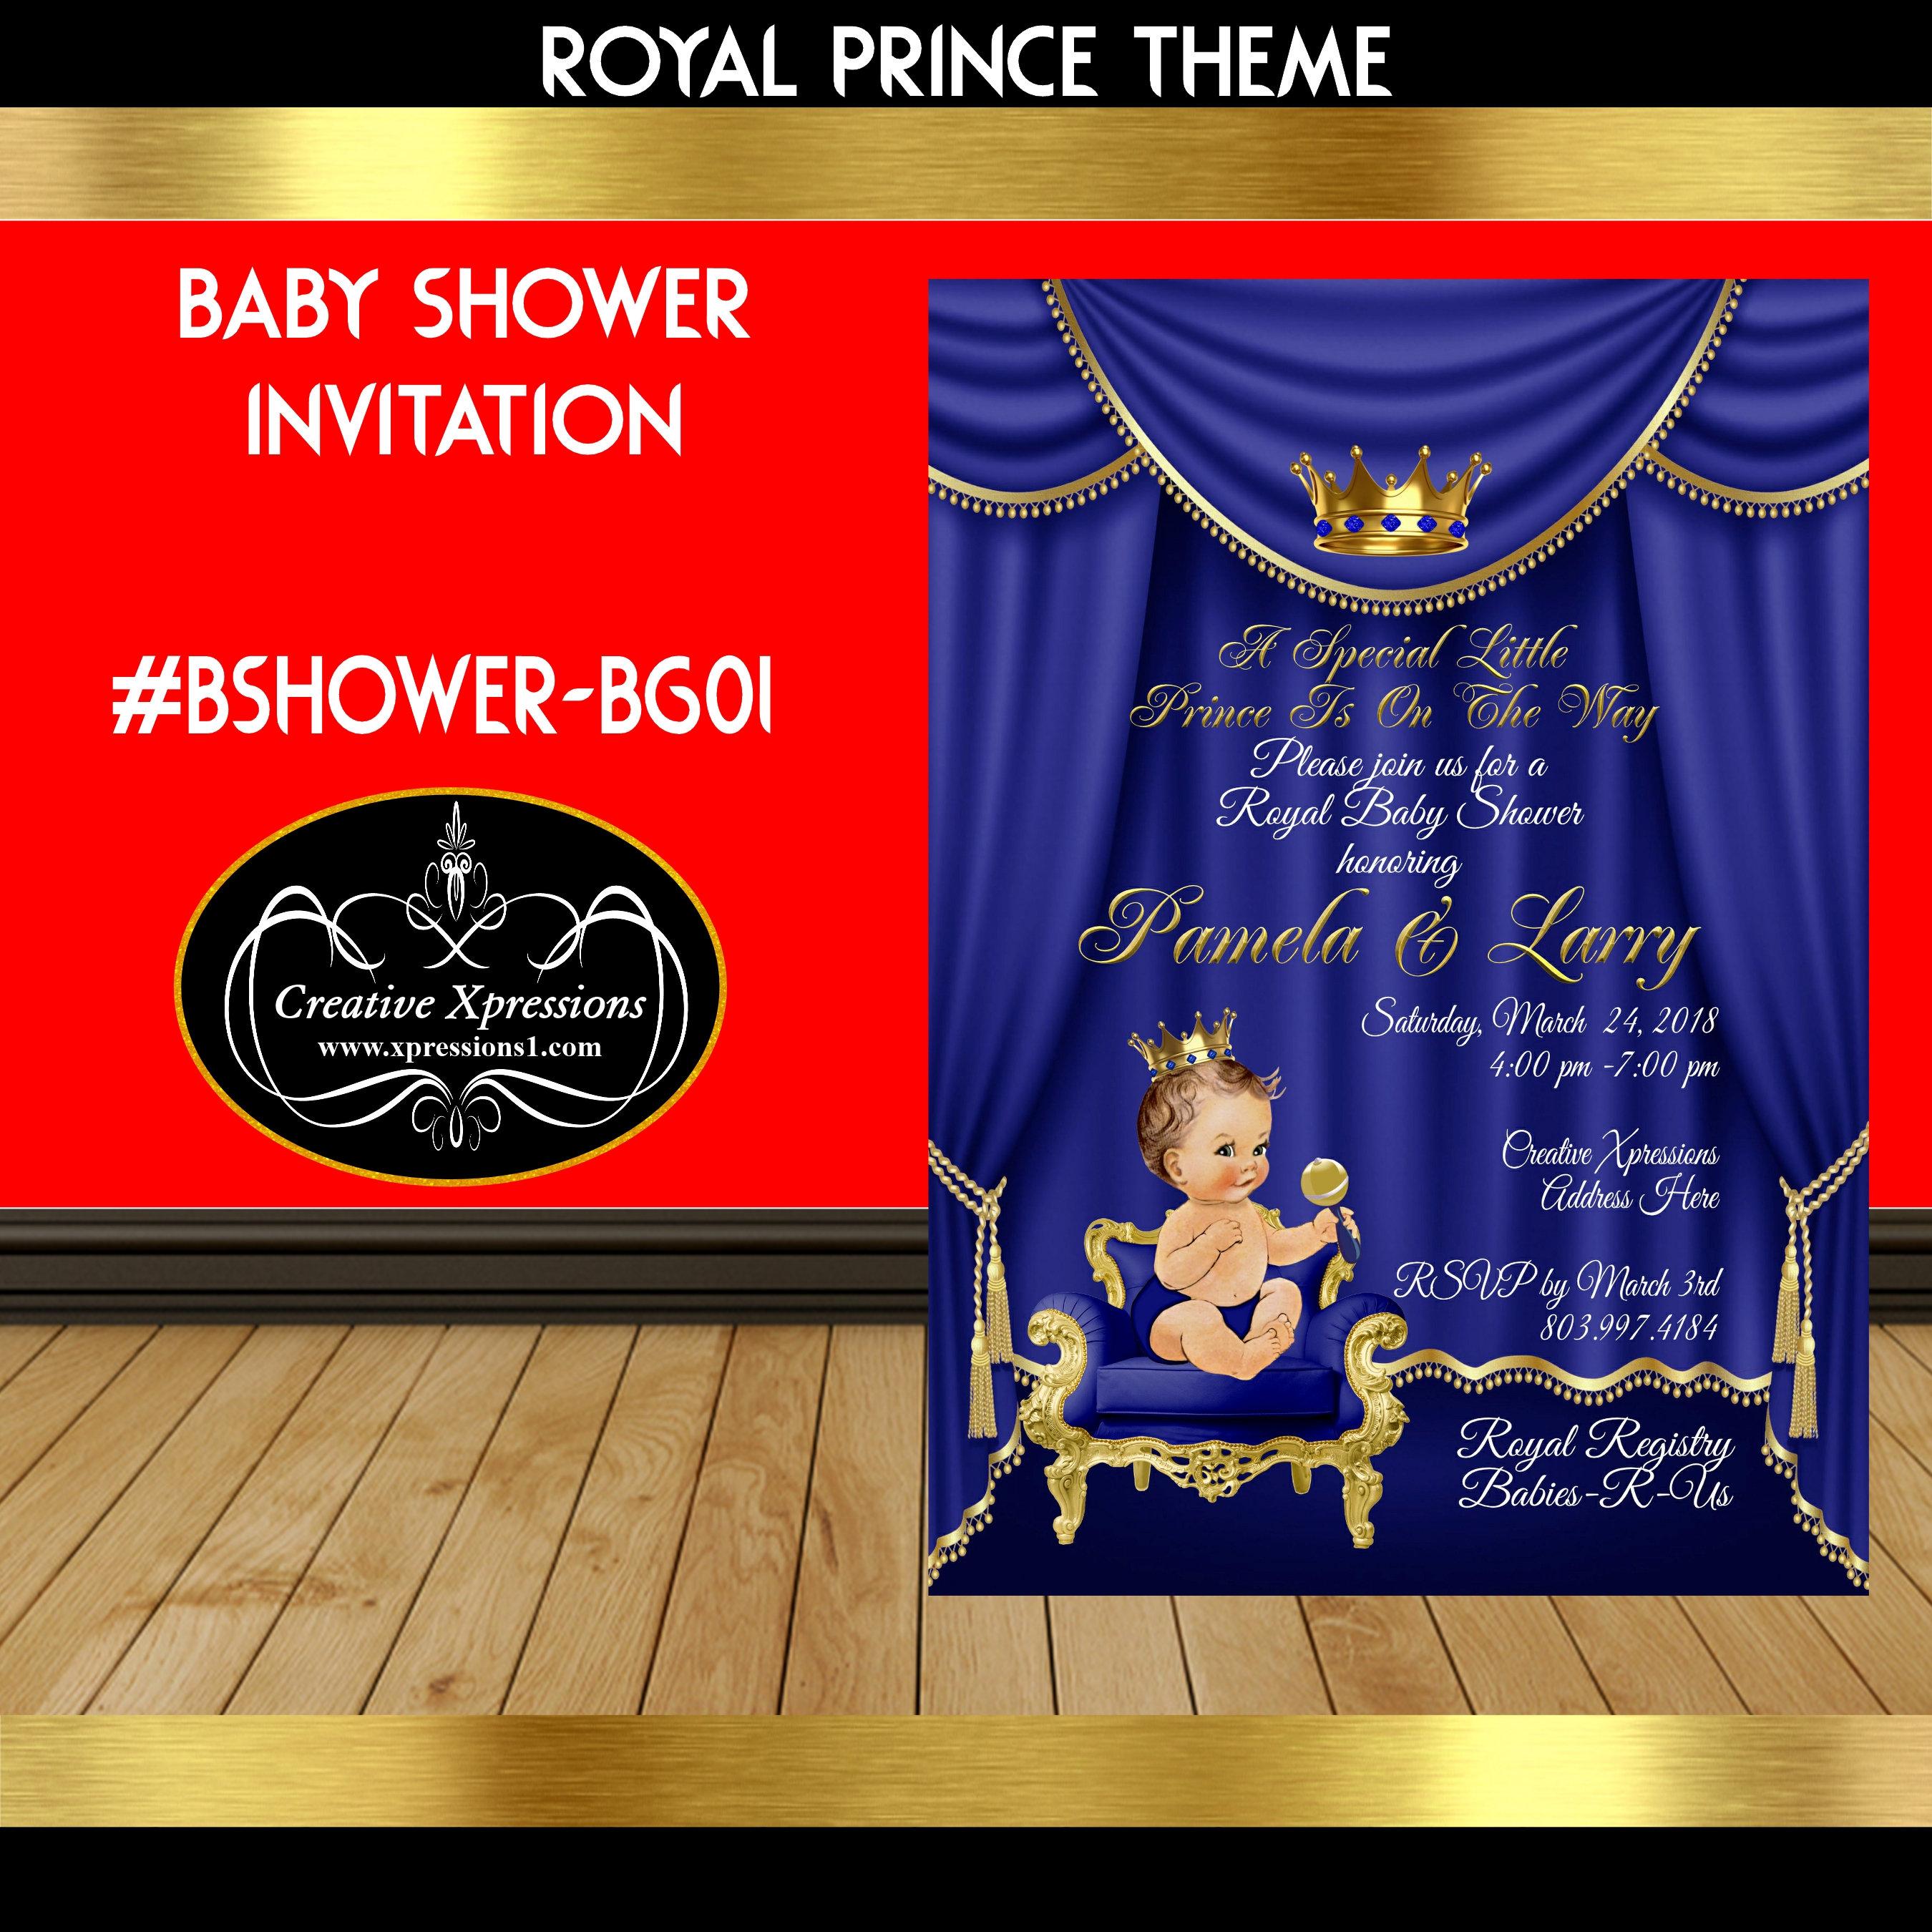 Royal Prince in Royal Blue and Gold Invitation Royal Blue